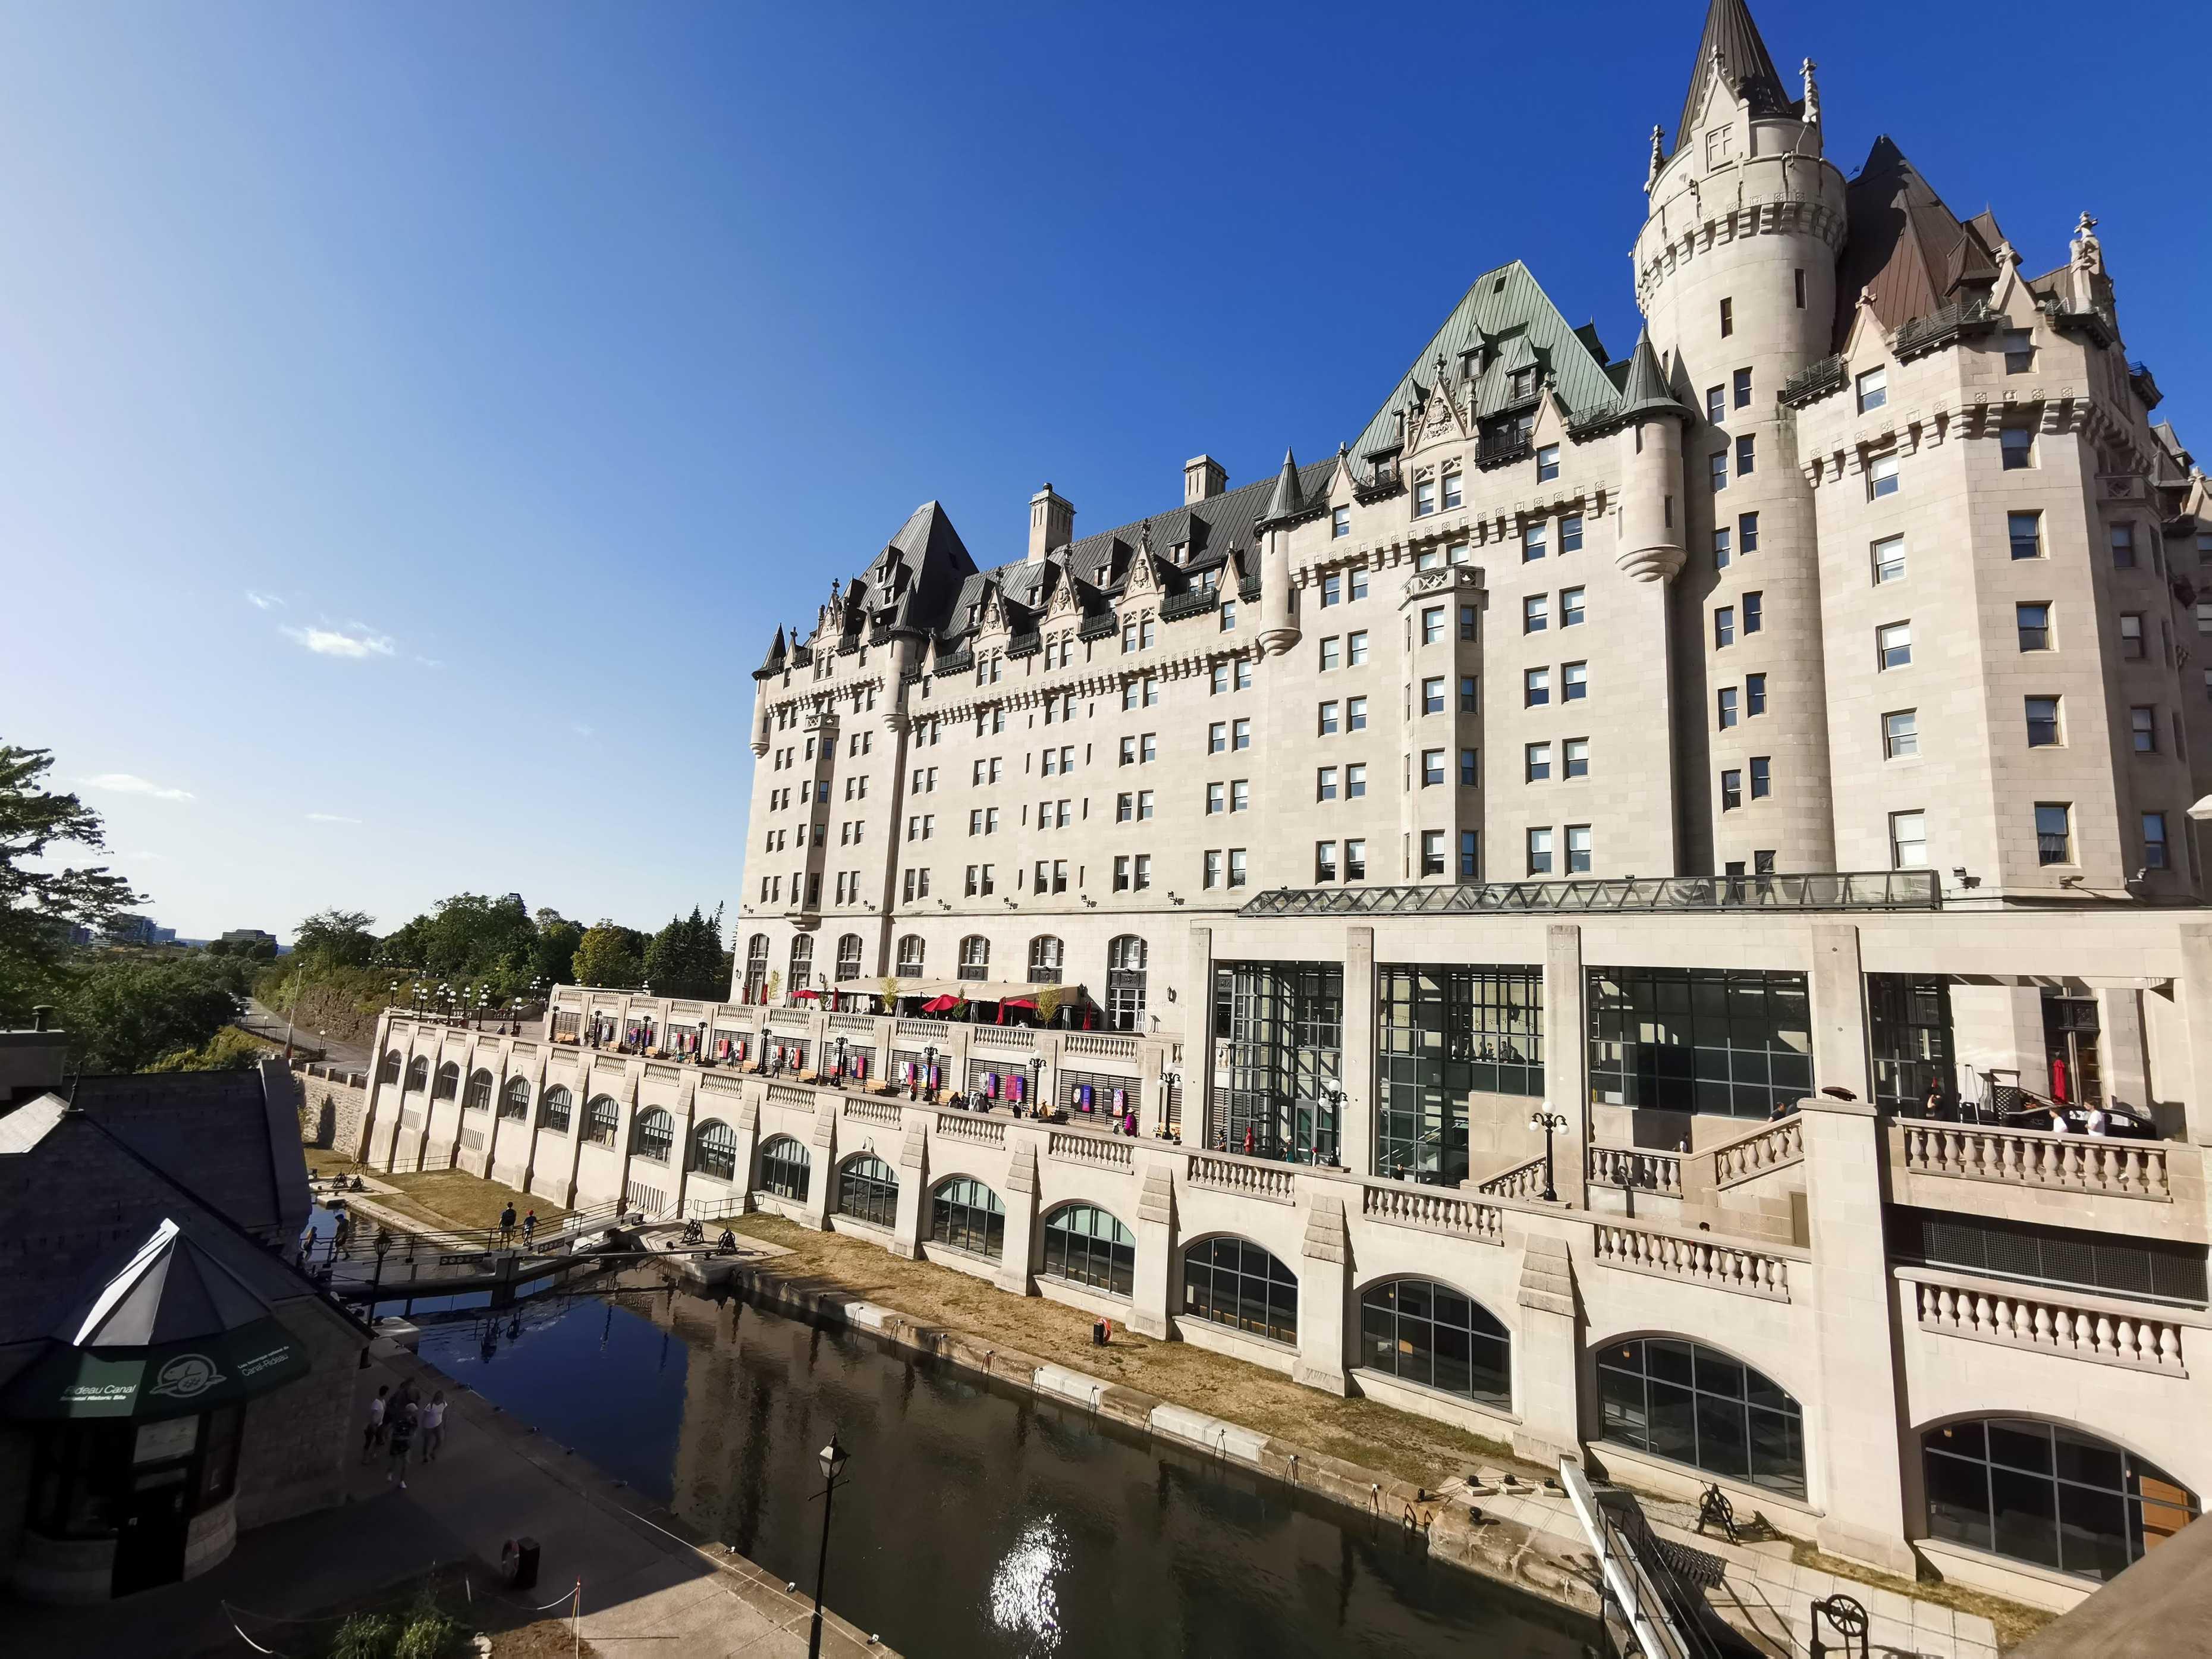 Niagara et Ottawa: Le bout du chemin cover image